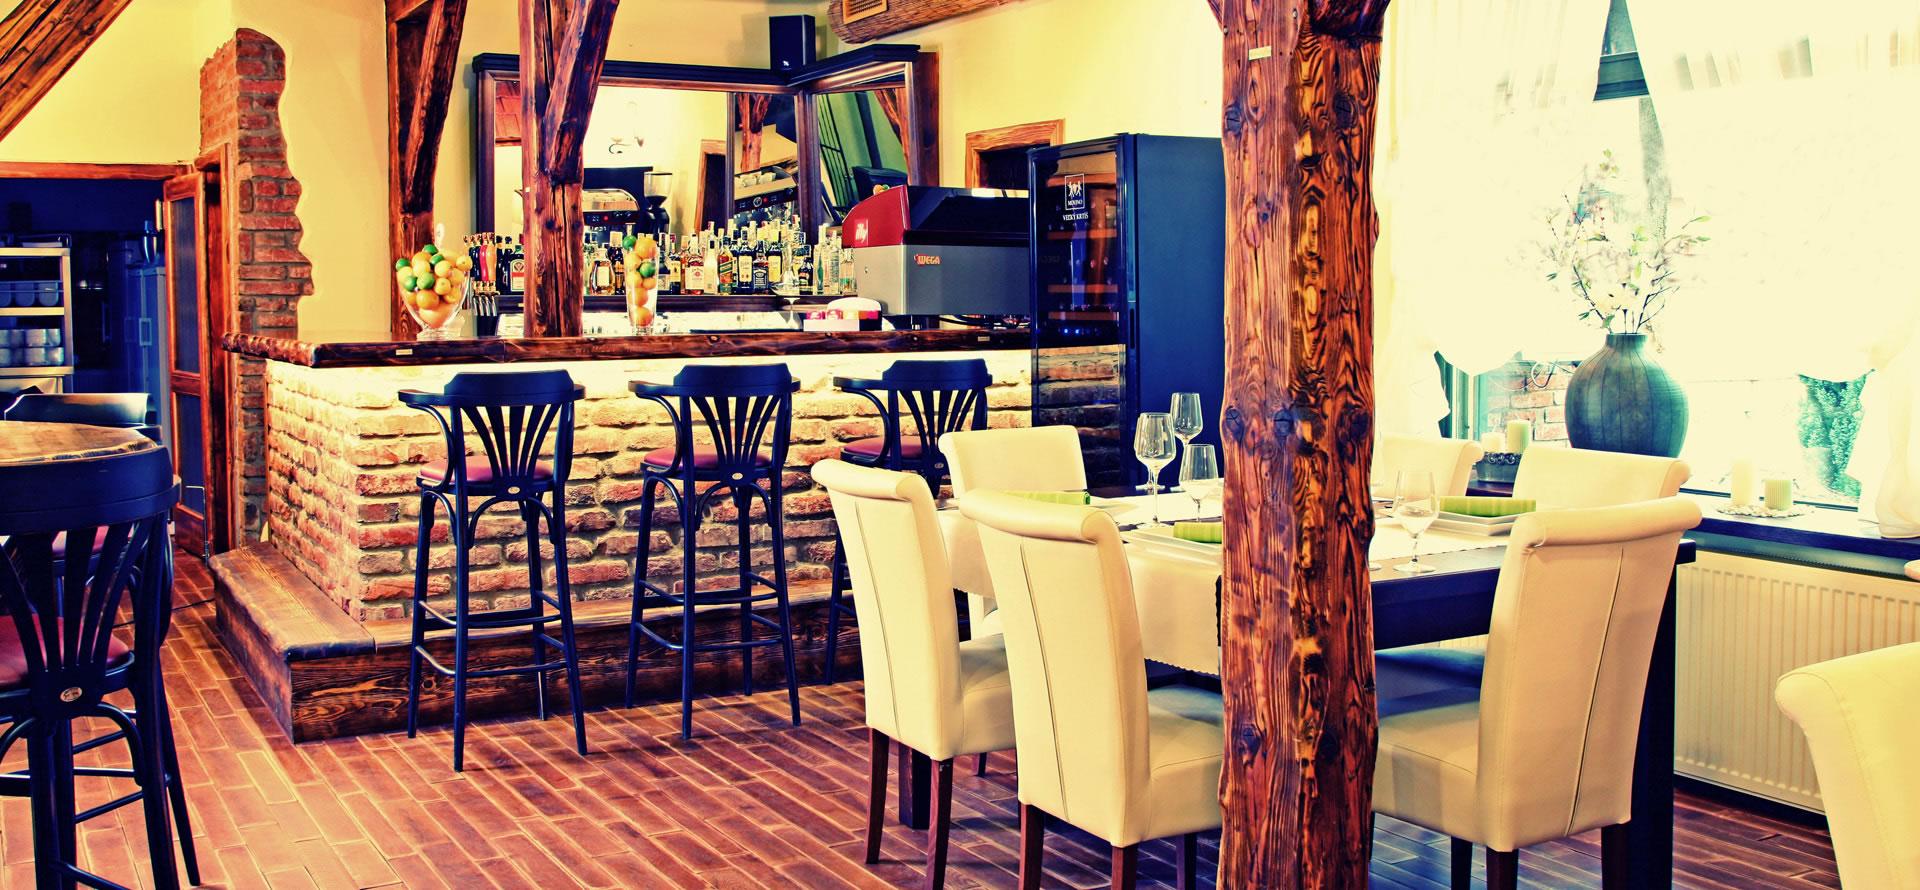 46a1bce8f Restauracia Barock | Úvod